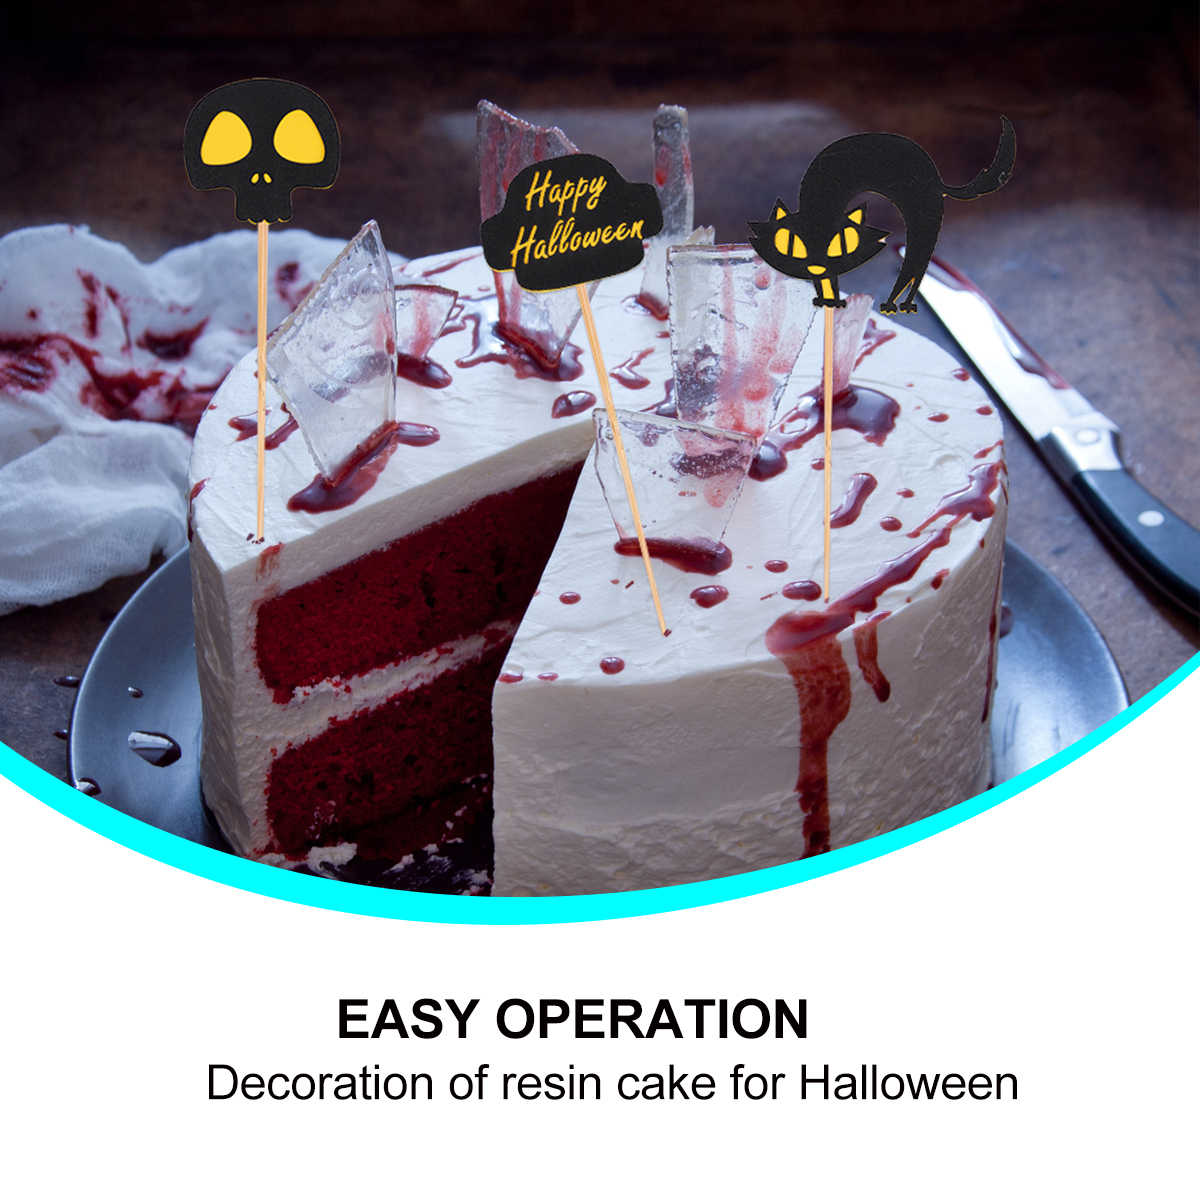 9 Stucke Halloween Kuchen Topper Lustige Kuchen Dekorieren Topper Dessert Cupcake Topper Kreative Dessert Obst Einfugen Partei Liefert Cake Deko Aliexpress